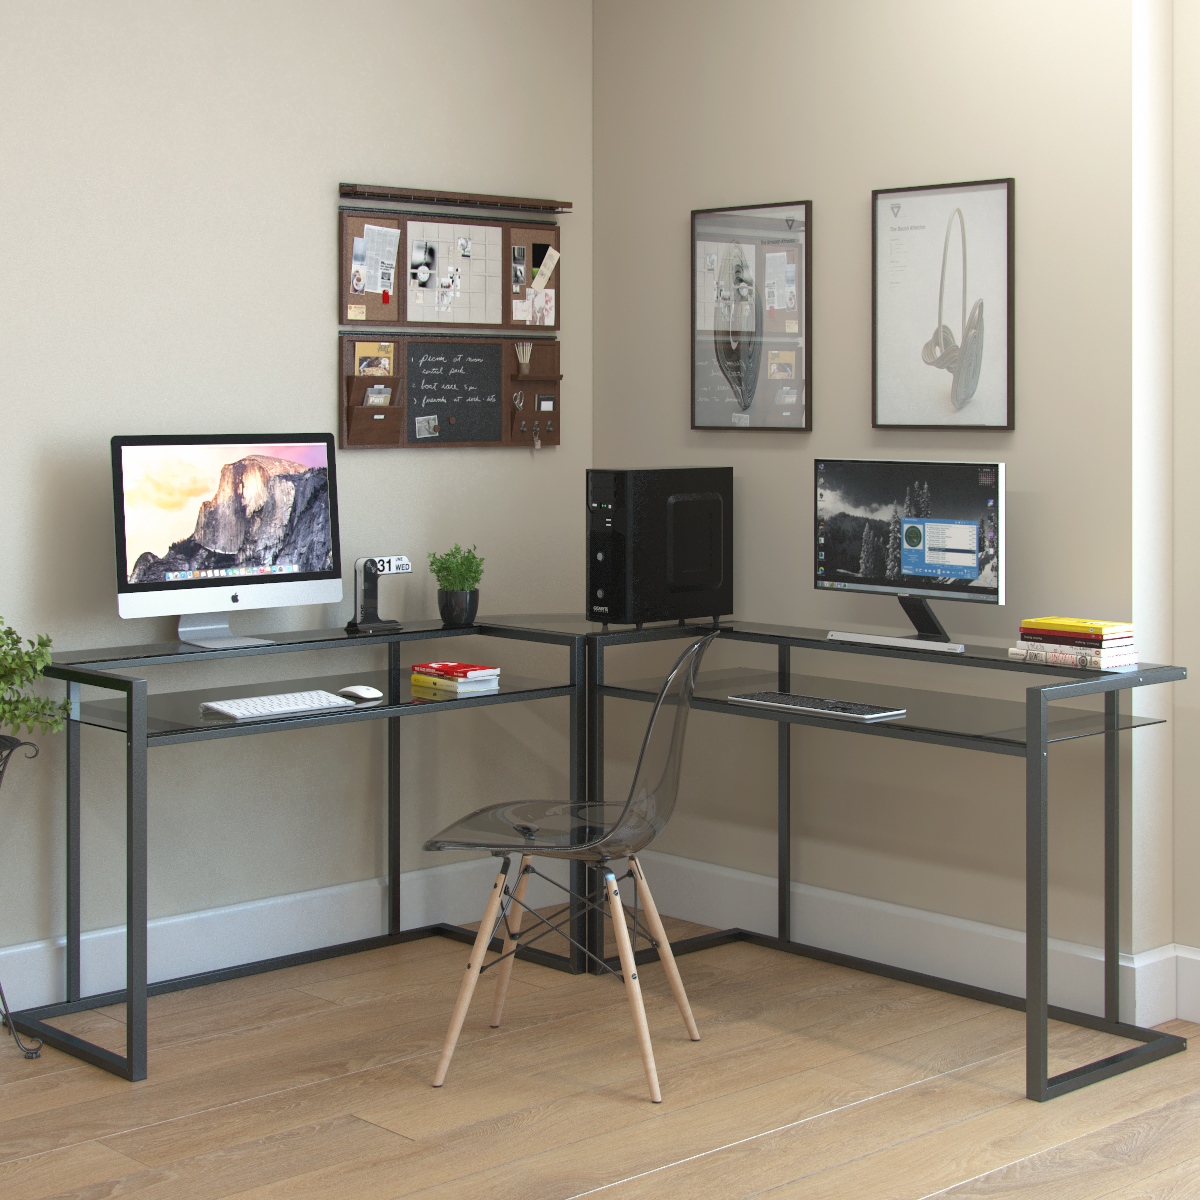 furniture computer l altra raw glass magnifier desks shaped desk